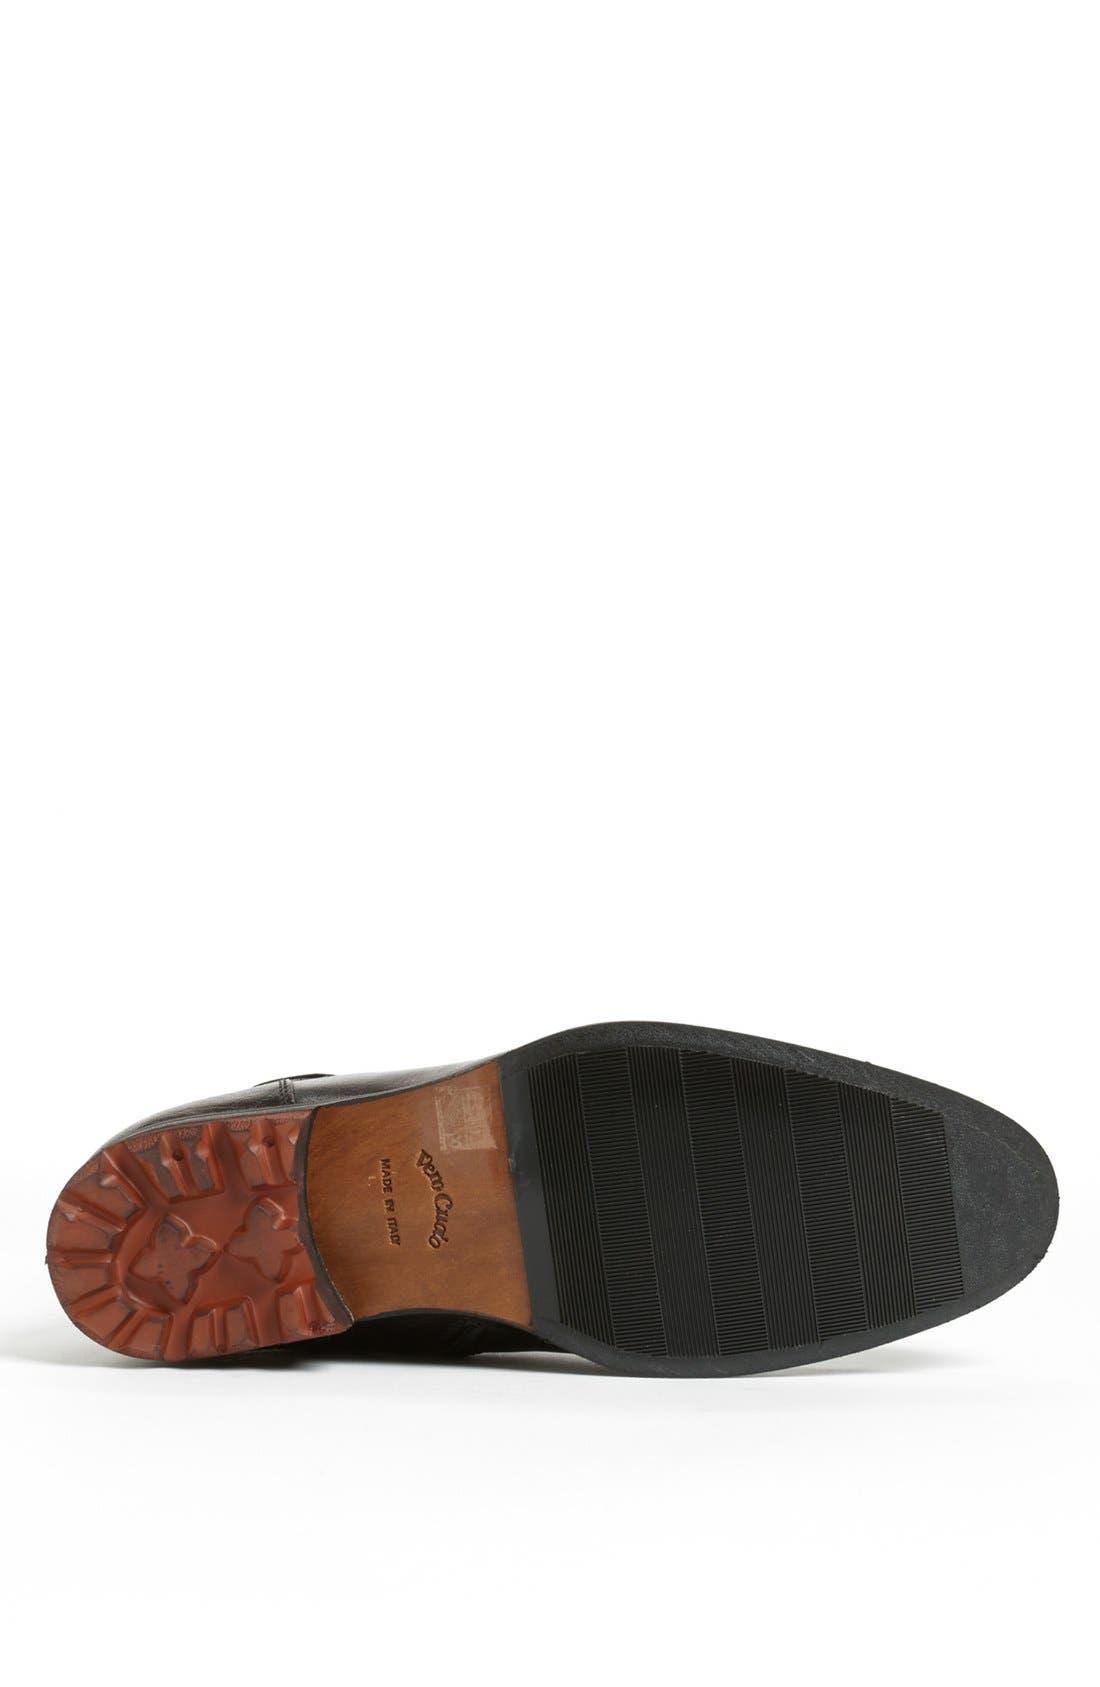 Alternate Image 4  - Bacco Bucci 'Devito' Zip boot (Men) (Online Only)